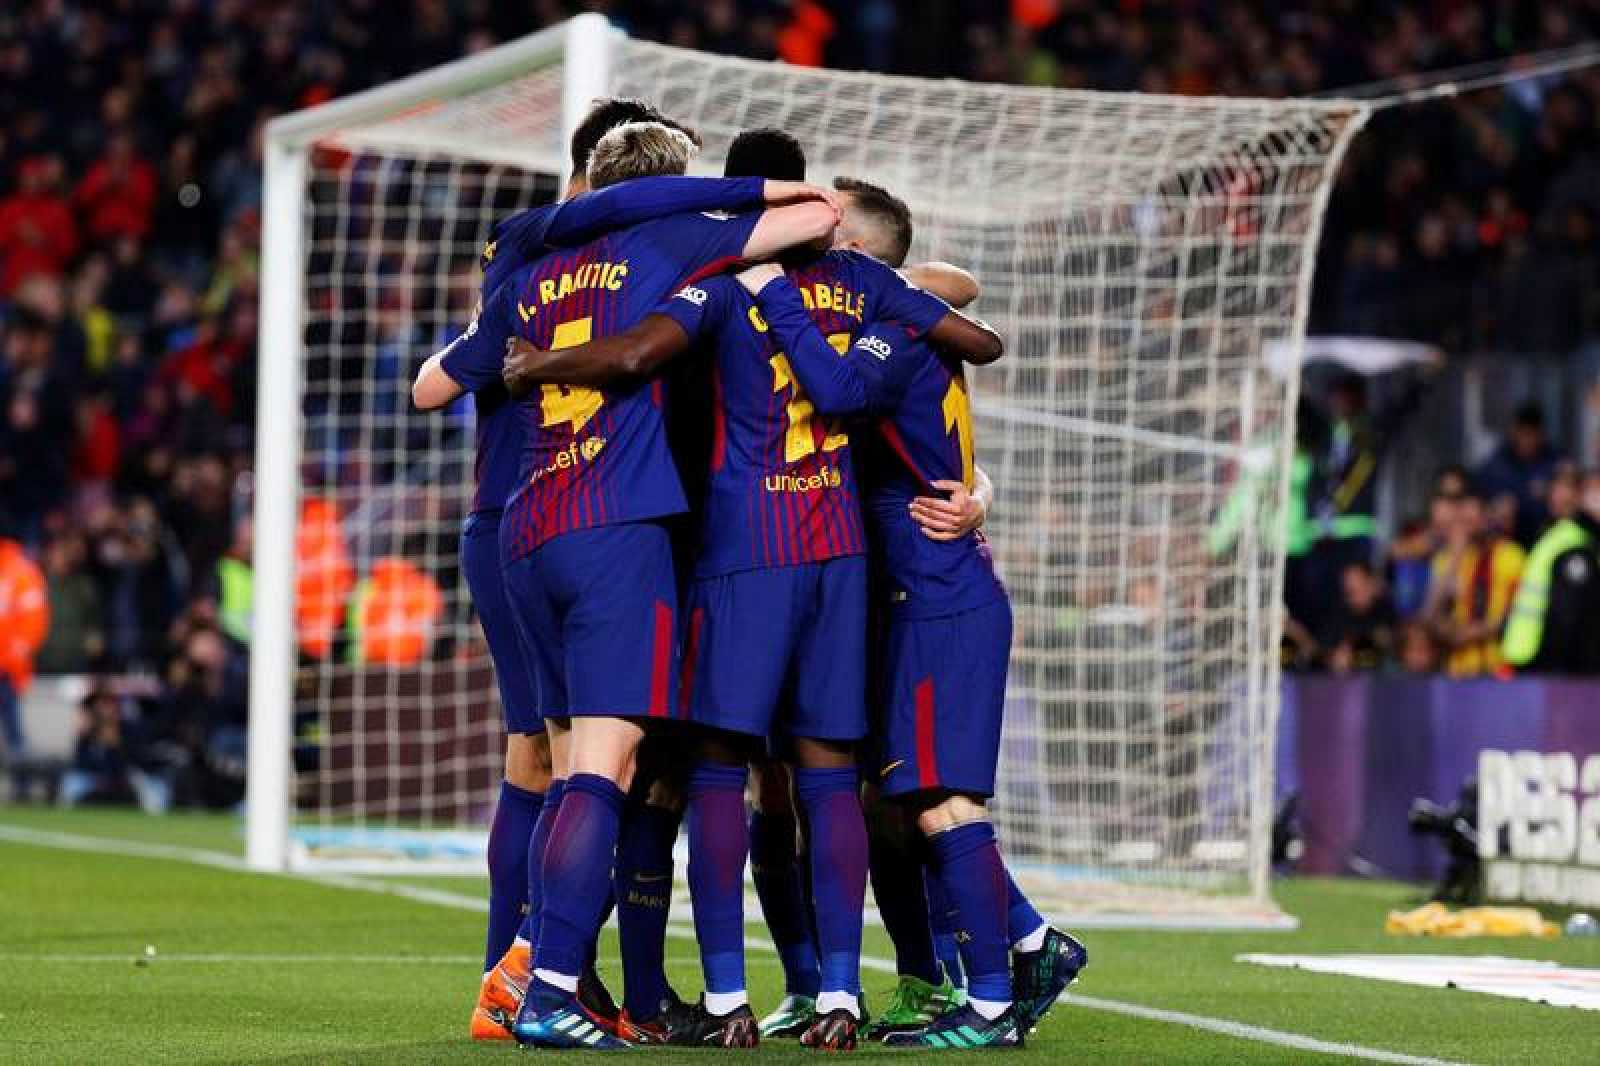 Los jugadores del FC Barcelona celebran el tercer gol ante el Leganés.